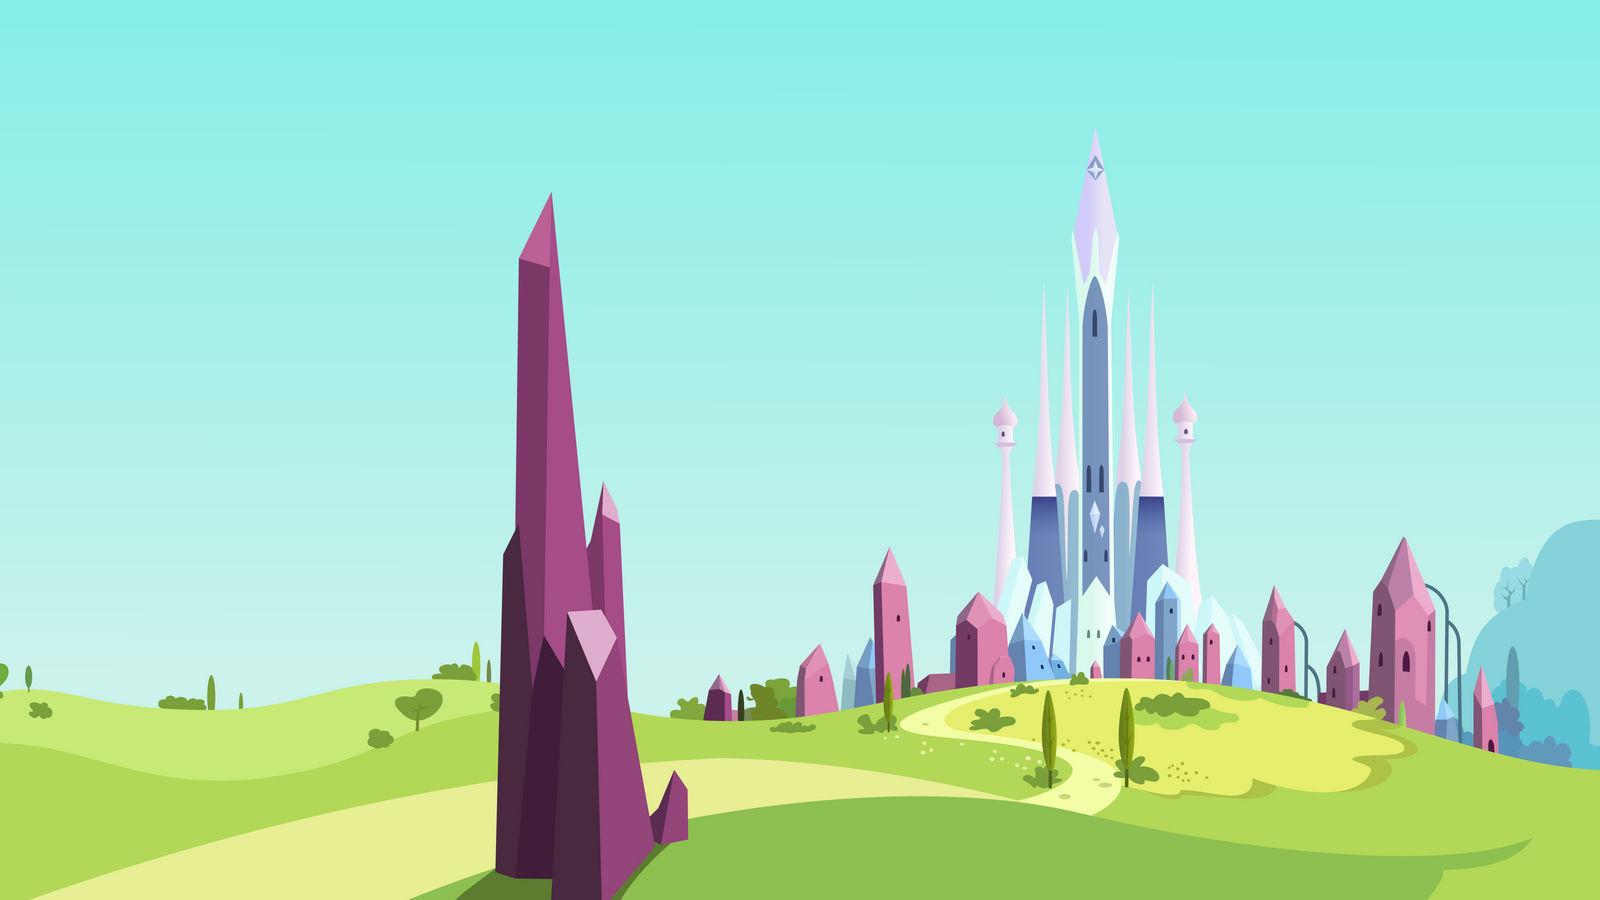 Crystal Palace by 3luk